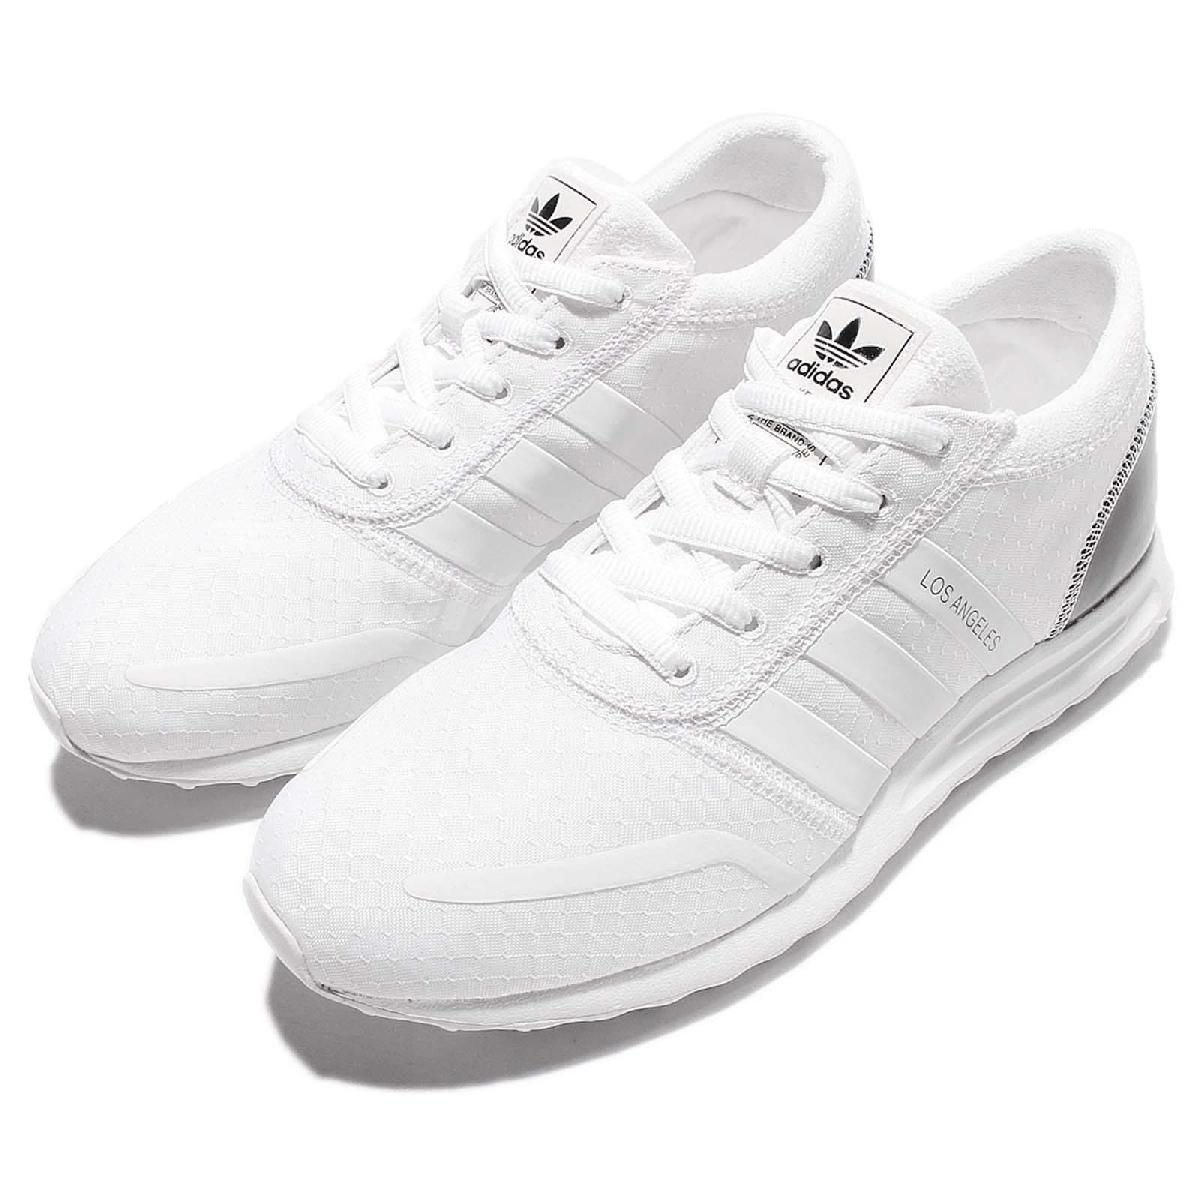 adidas 休閒鞋 Los Angeles W 白 黑 亮皮 三葉草 運動鞋 女鞋【PUMP306】 S79765